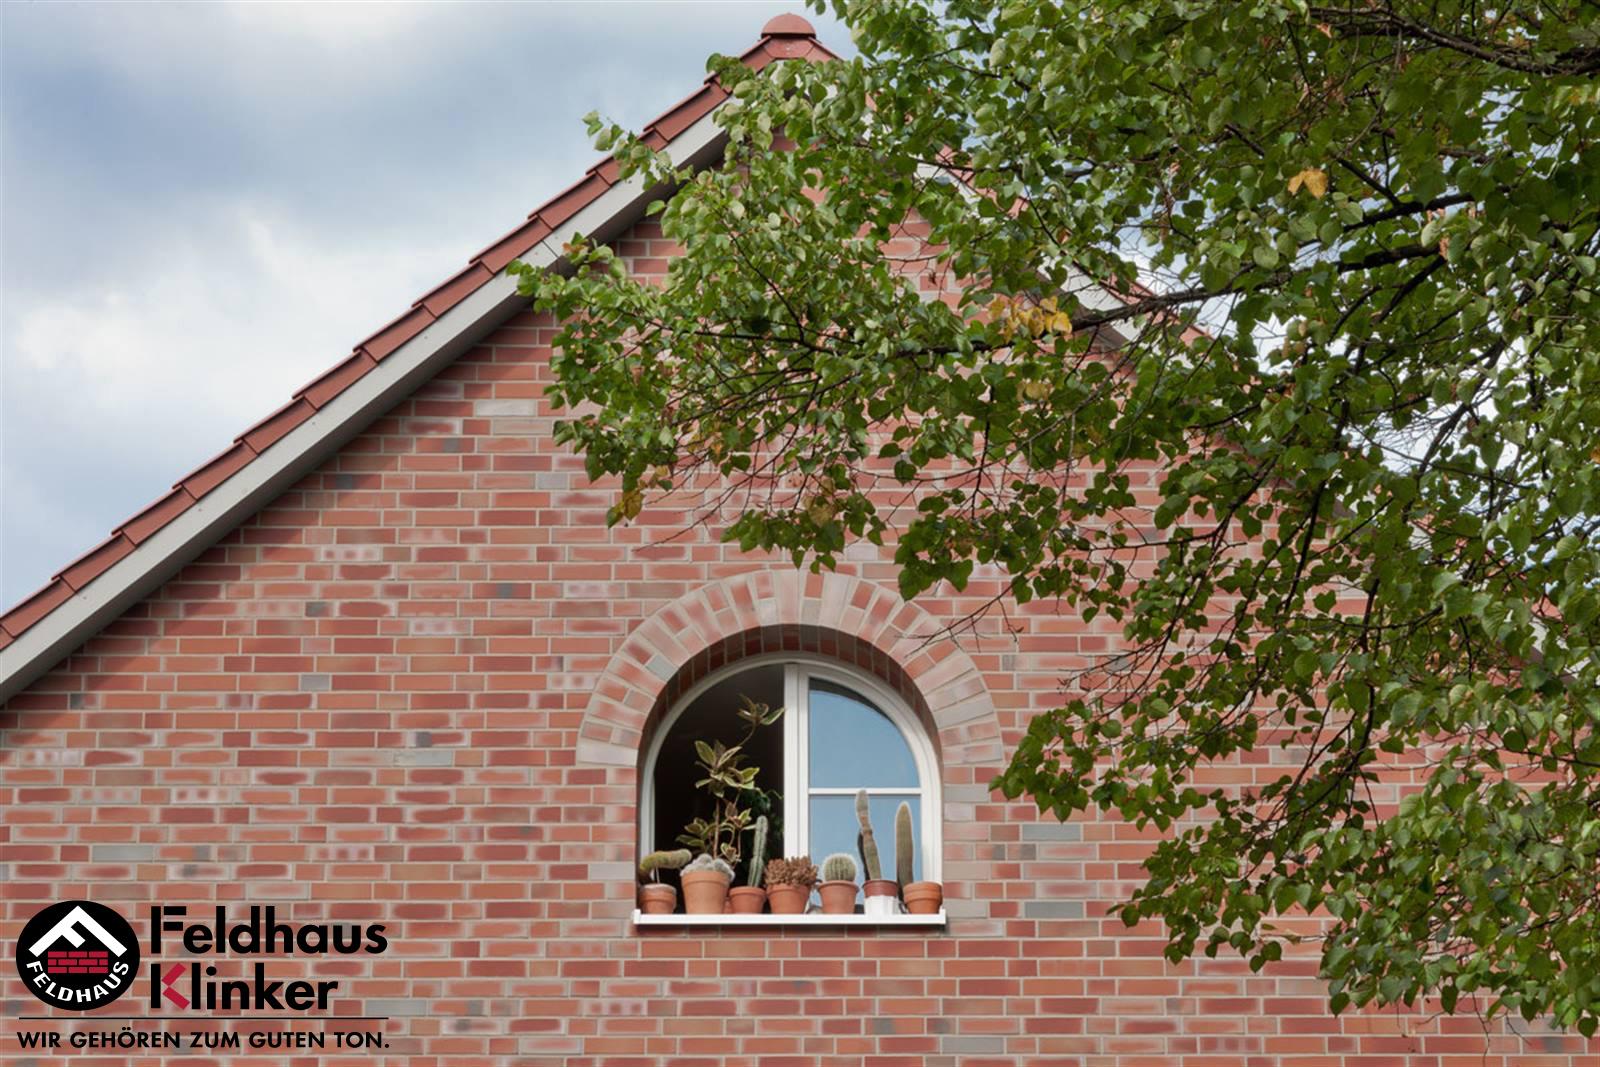 991 Feldhaus Klinker (2)